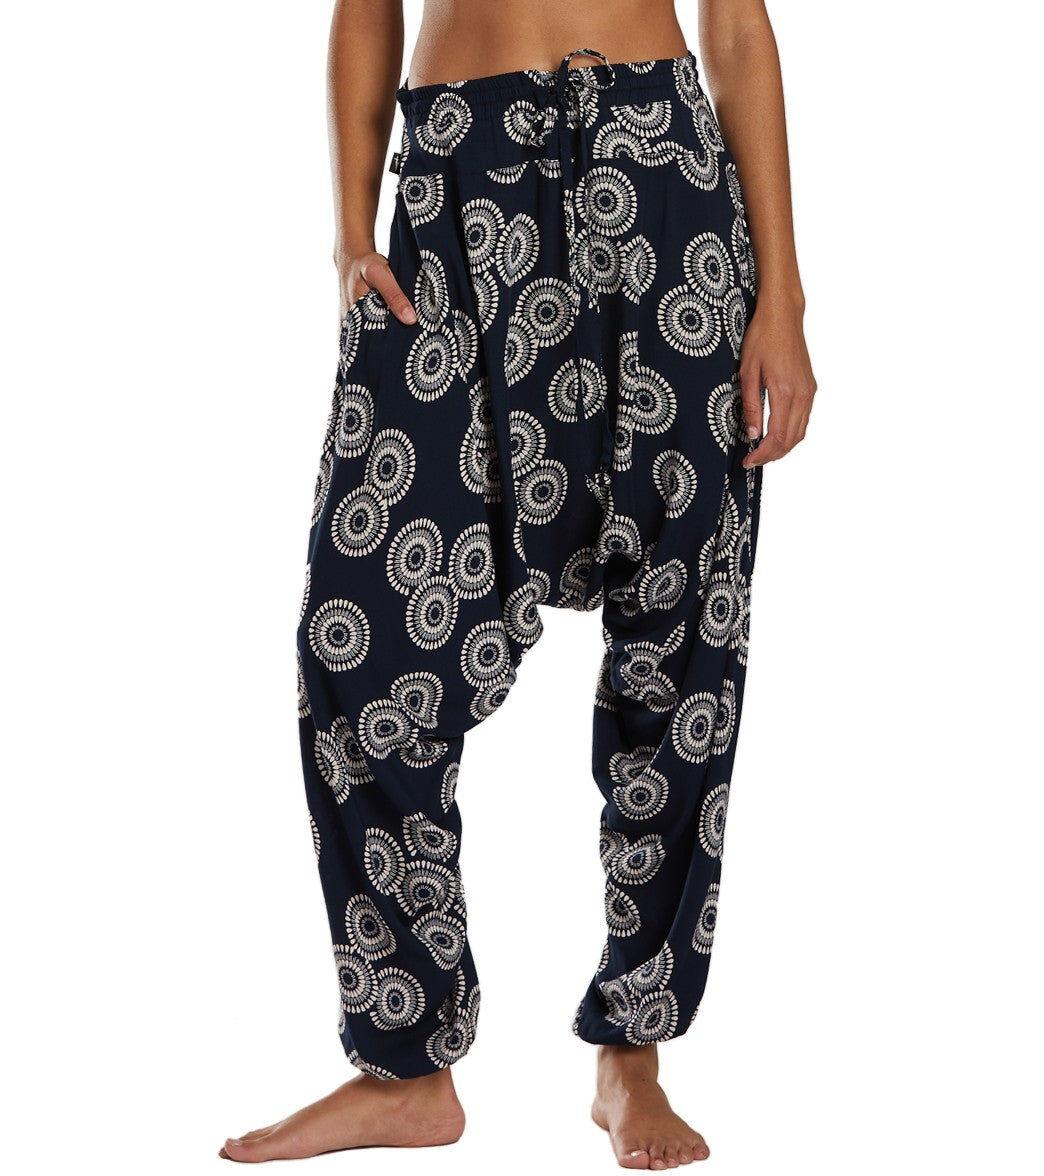 Buddha Pants Women's Sunshine Harem - Navy Blue Large Cotton